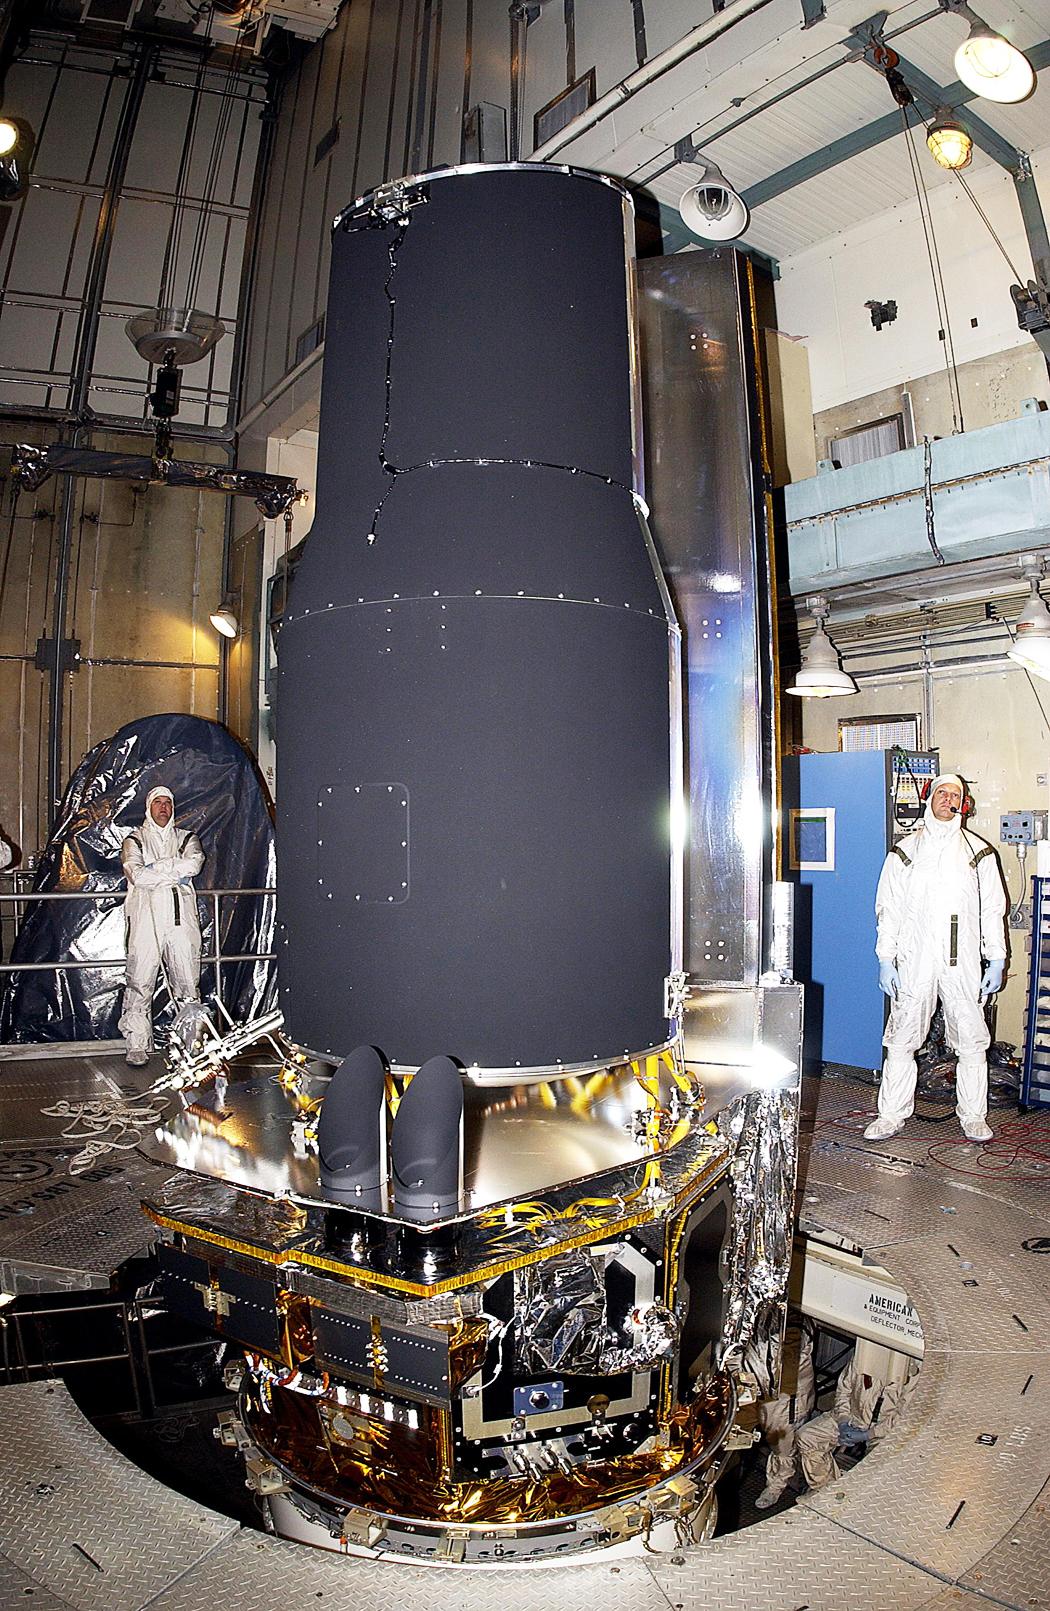 space shuttle program goals - photo #8